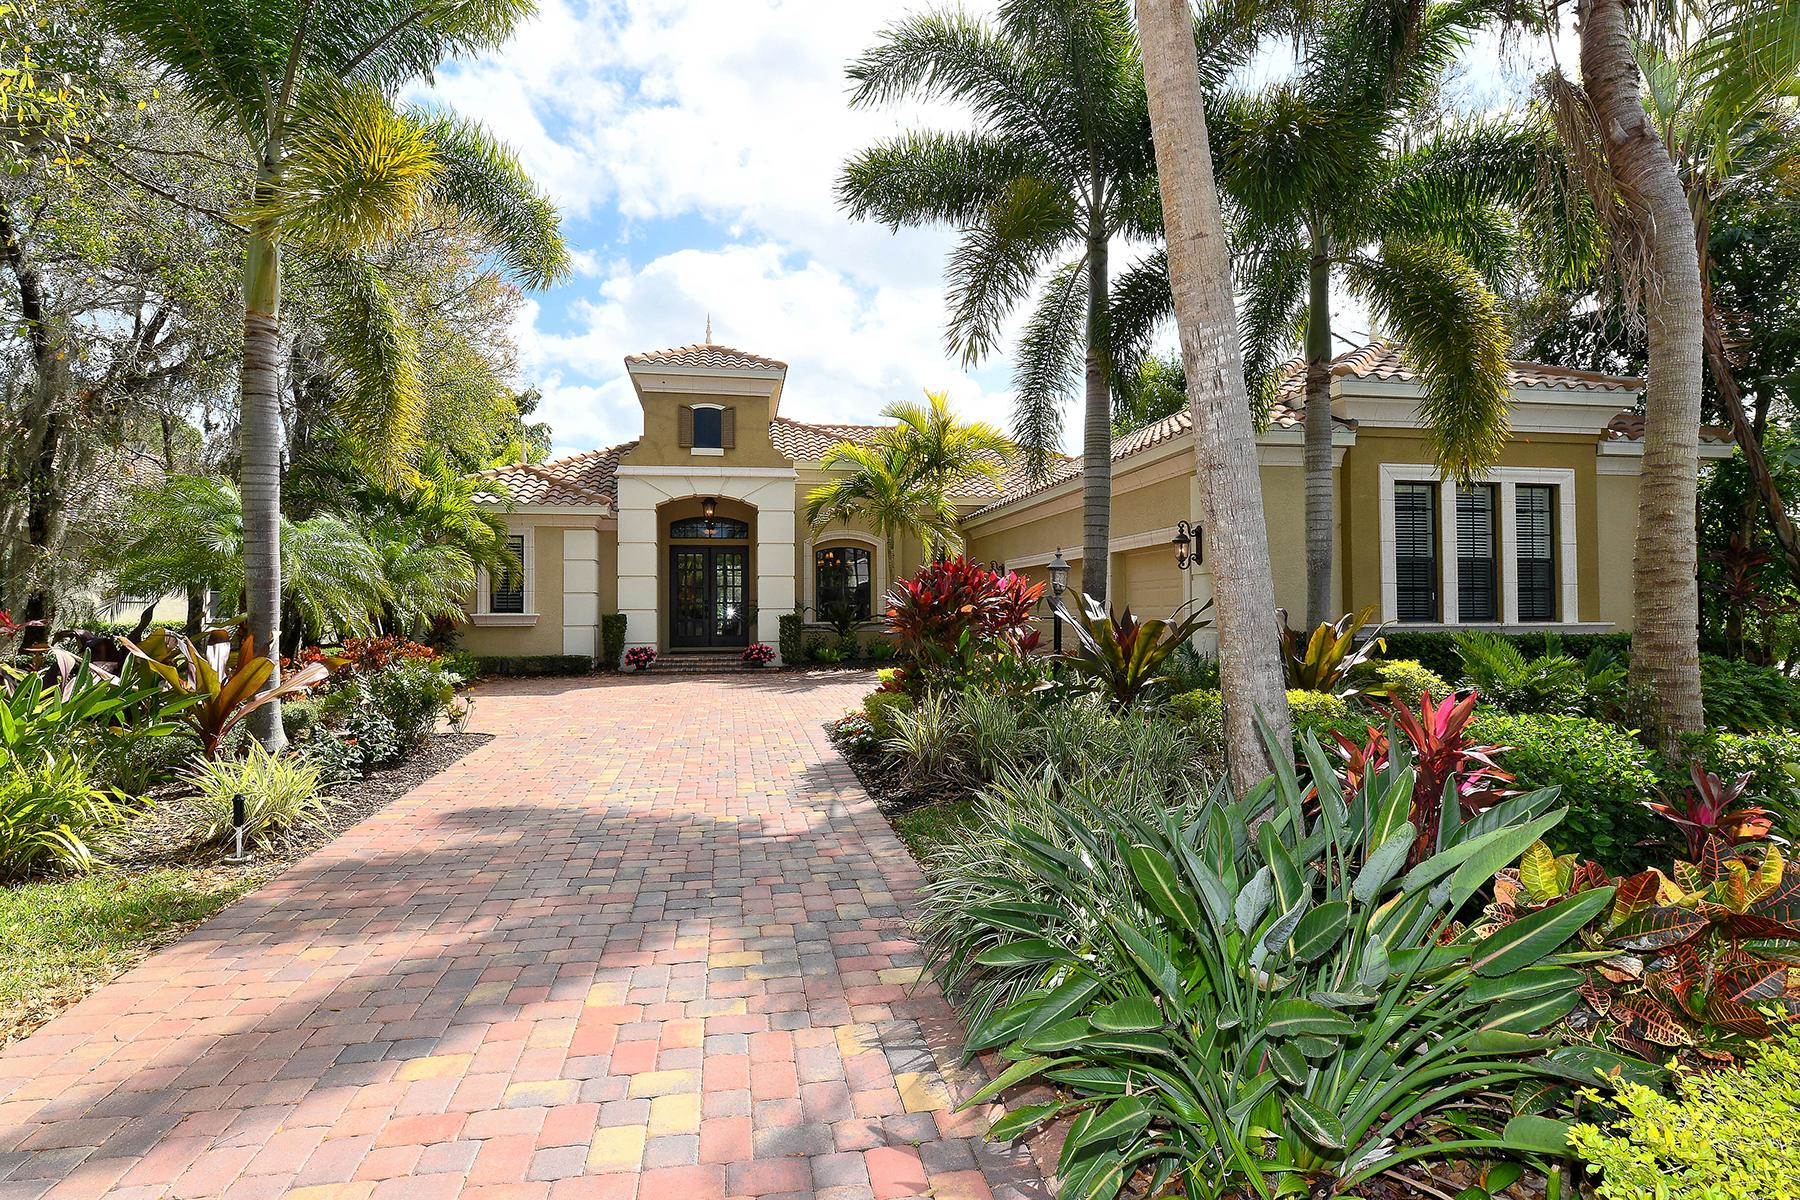 Casa para uma família para Venda às LAKEWOOD RANCH COUNTRY CLUB 7527 Greystone St Lakewood Ranch, Florida, 34202 Estados Unidos